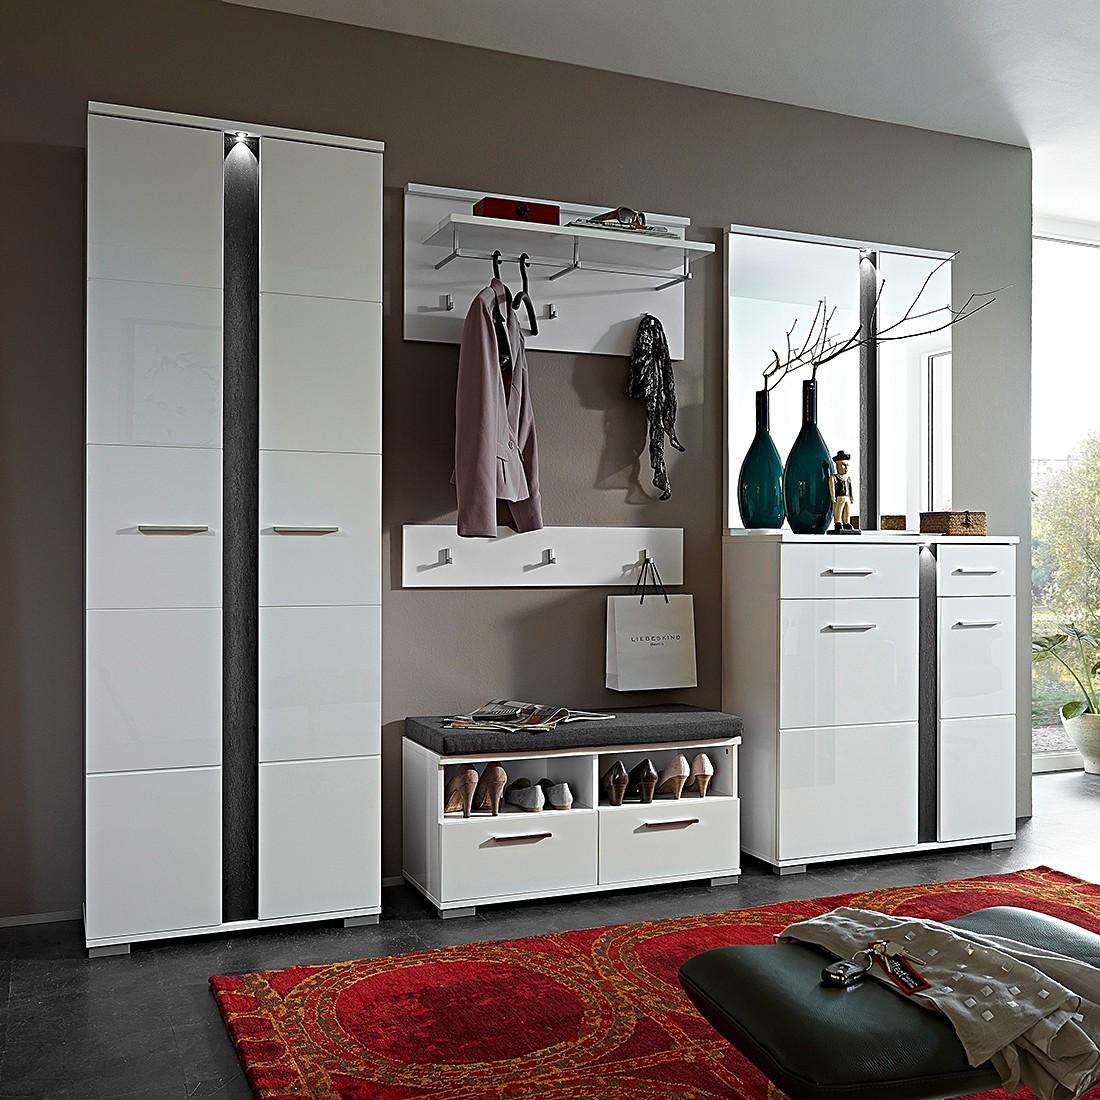 garderobenset campo 6 teilig hochglanz wei ebay. Black Bedroom Furniture Sets. Home Design Ideas